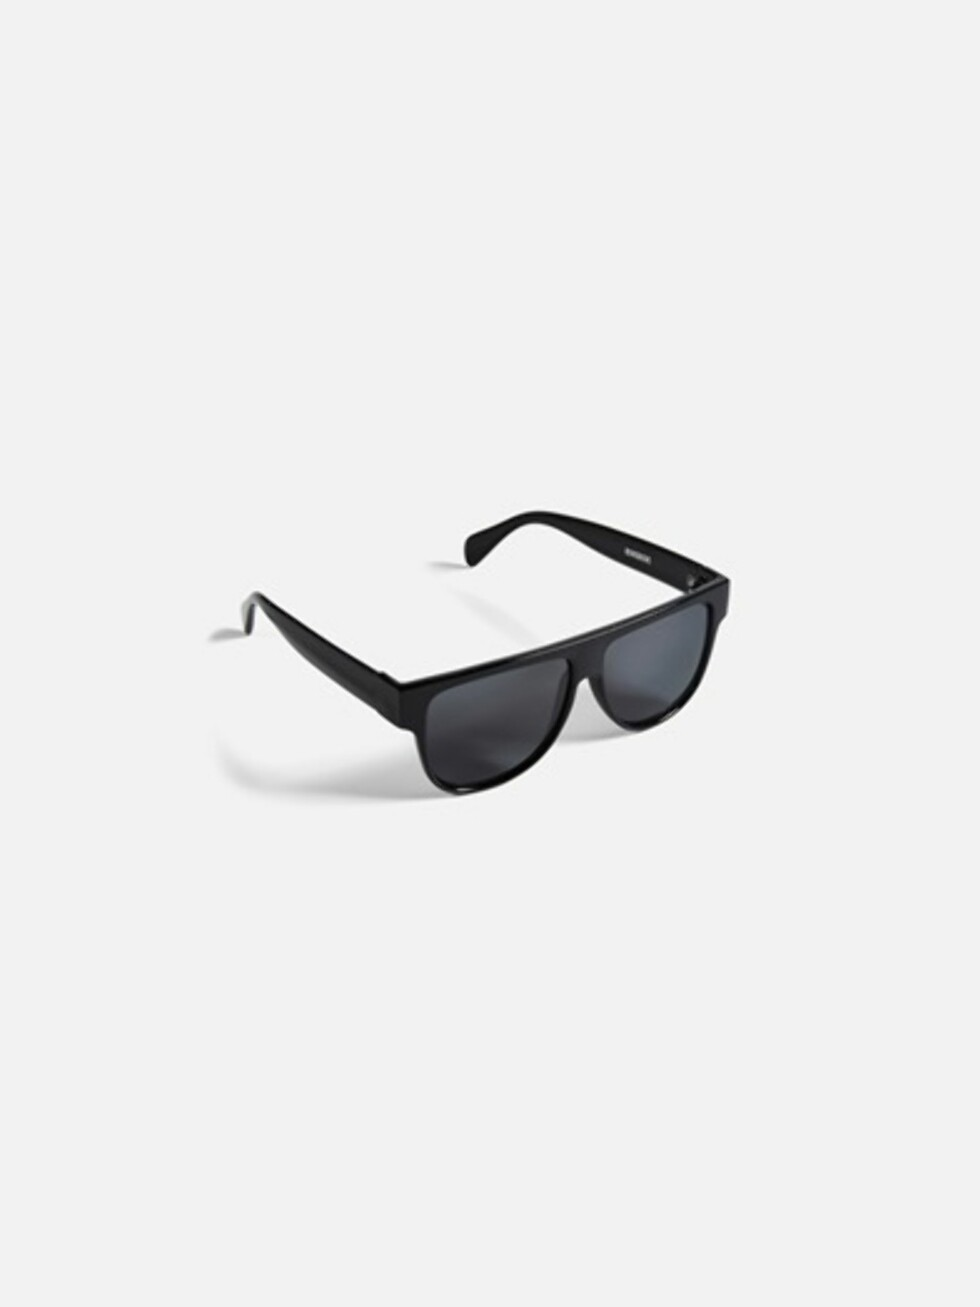 Sorte solbriller fra Bik Bok   kr 99   https://bikbok.com/no/7194409_F990